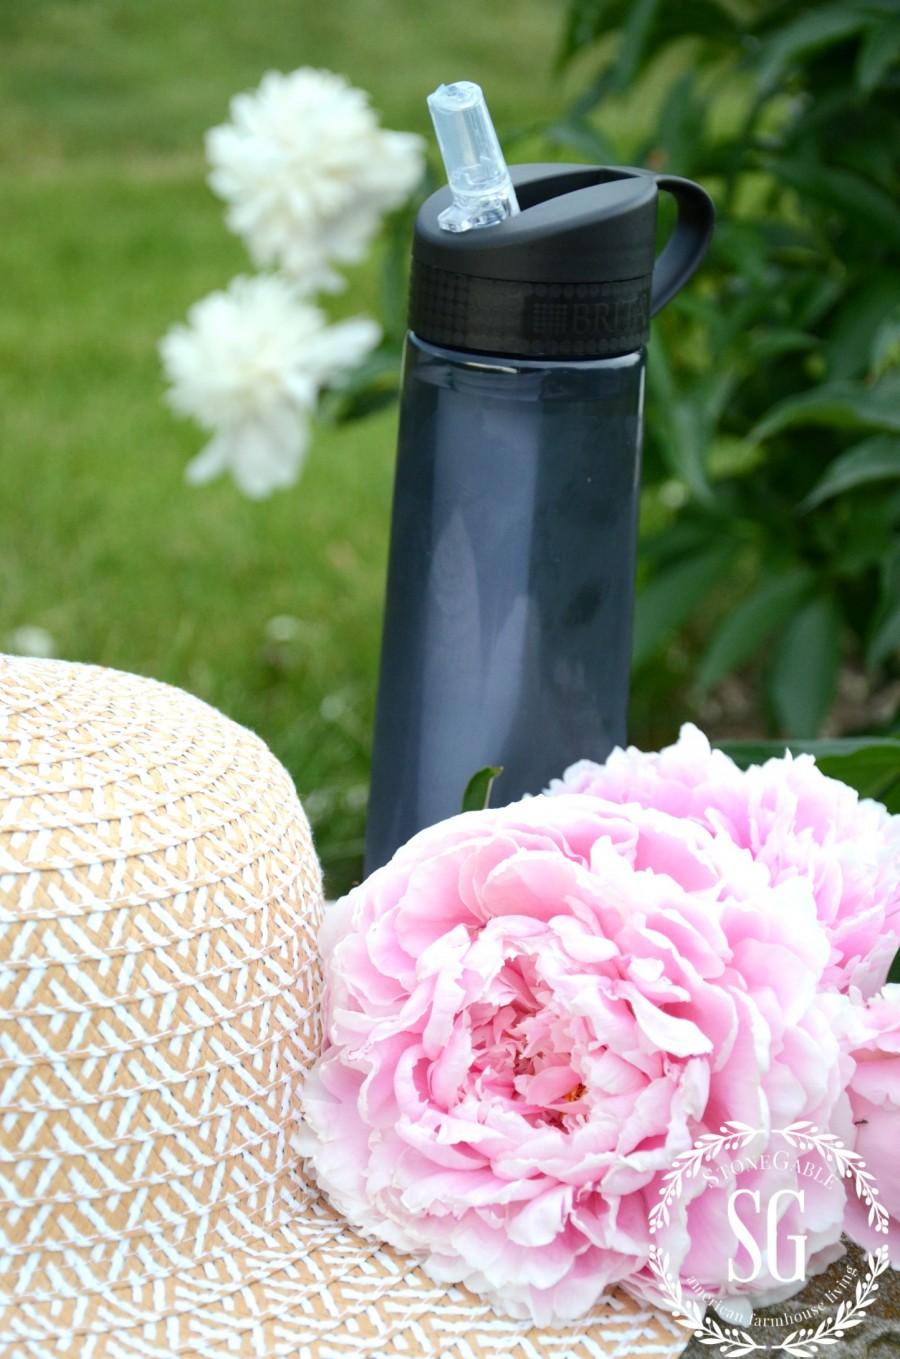 8 WAYS TO ENJOY GARDENING-brita in the garden-stonegableblog.com